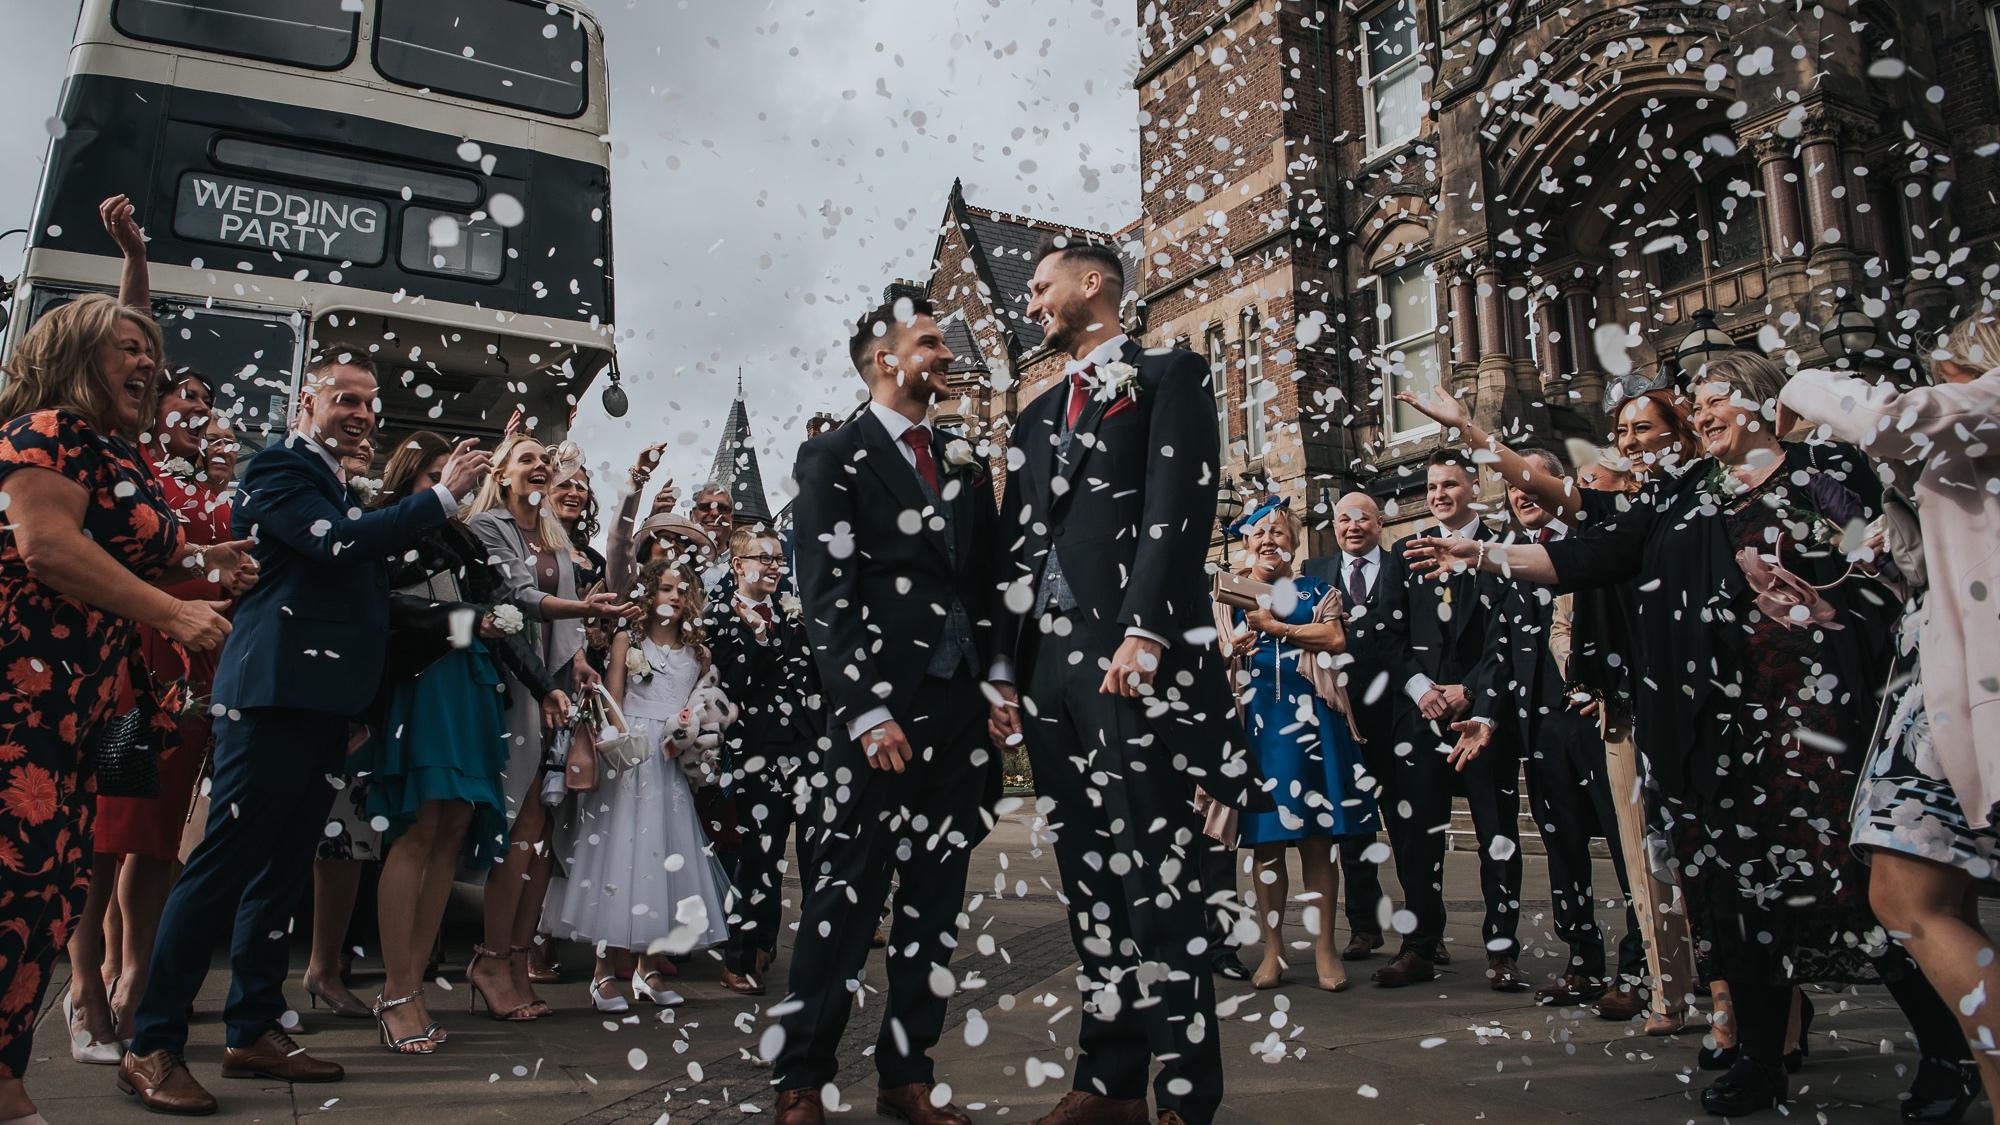 Hayloft+cheshire+wedding+same+sex+gay+wedding++%2825+of+35%29.jpg